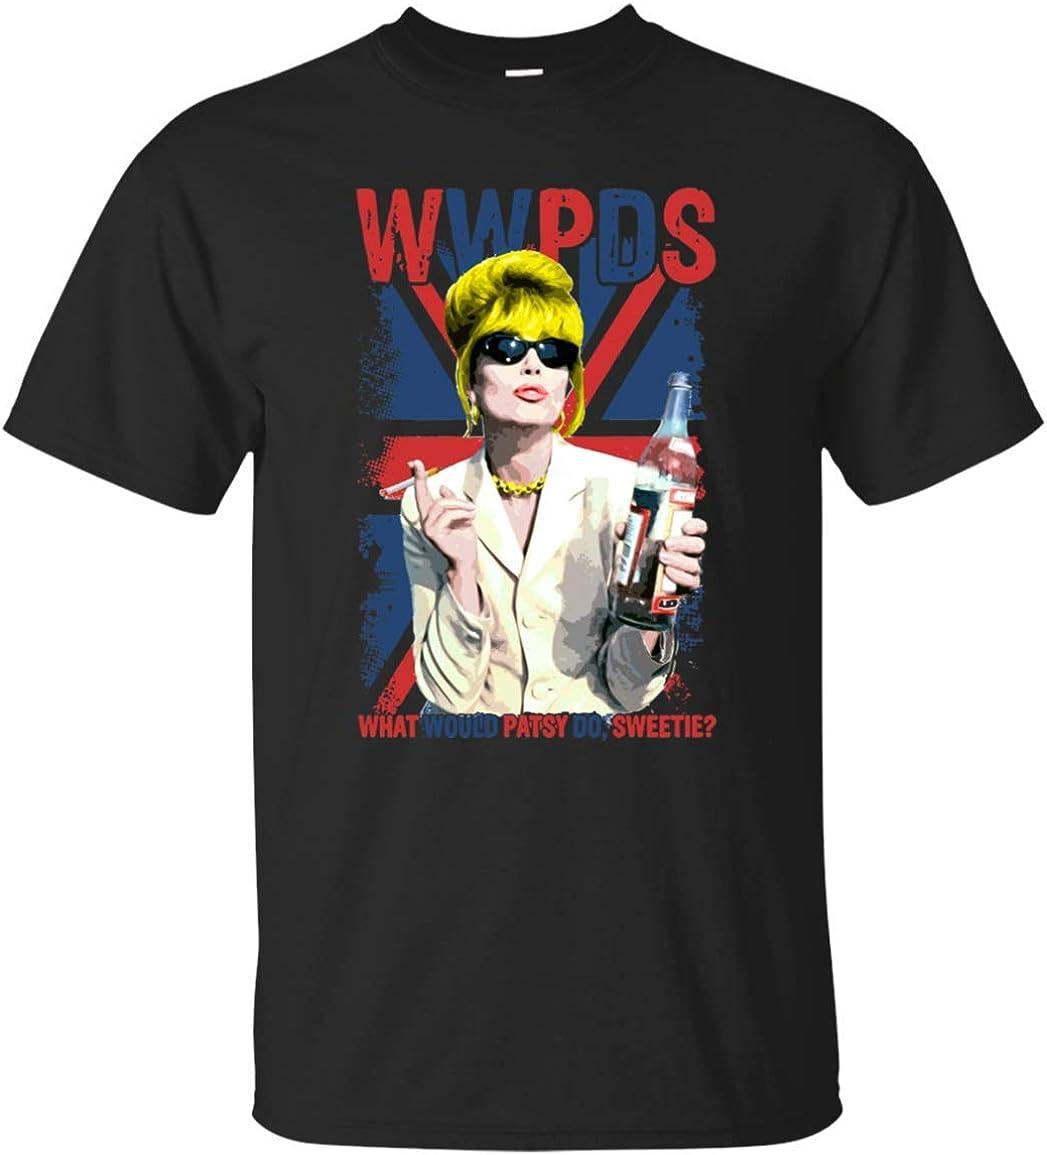 Lacroix Sweetie Absolutely Fabulous Vintage Retro Shirt Men US Top Gift